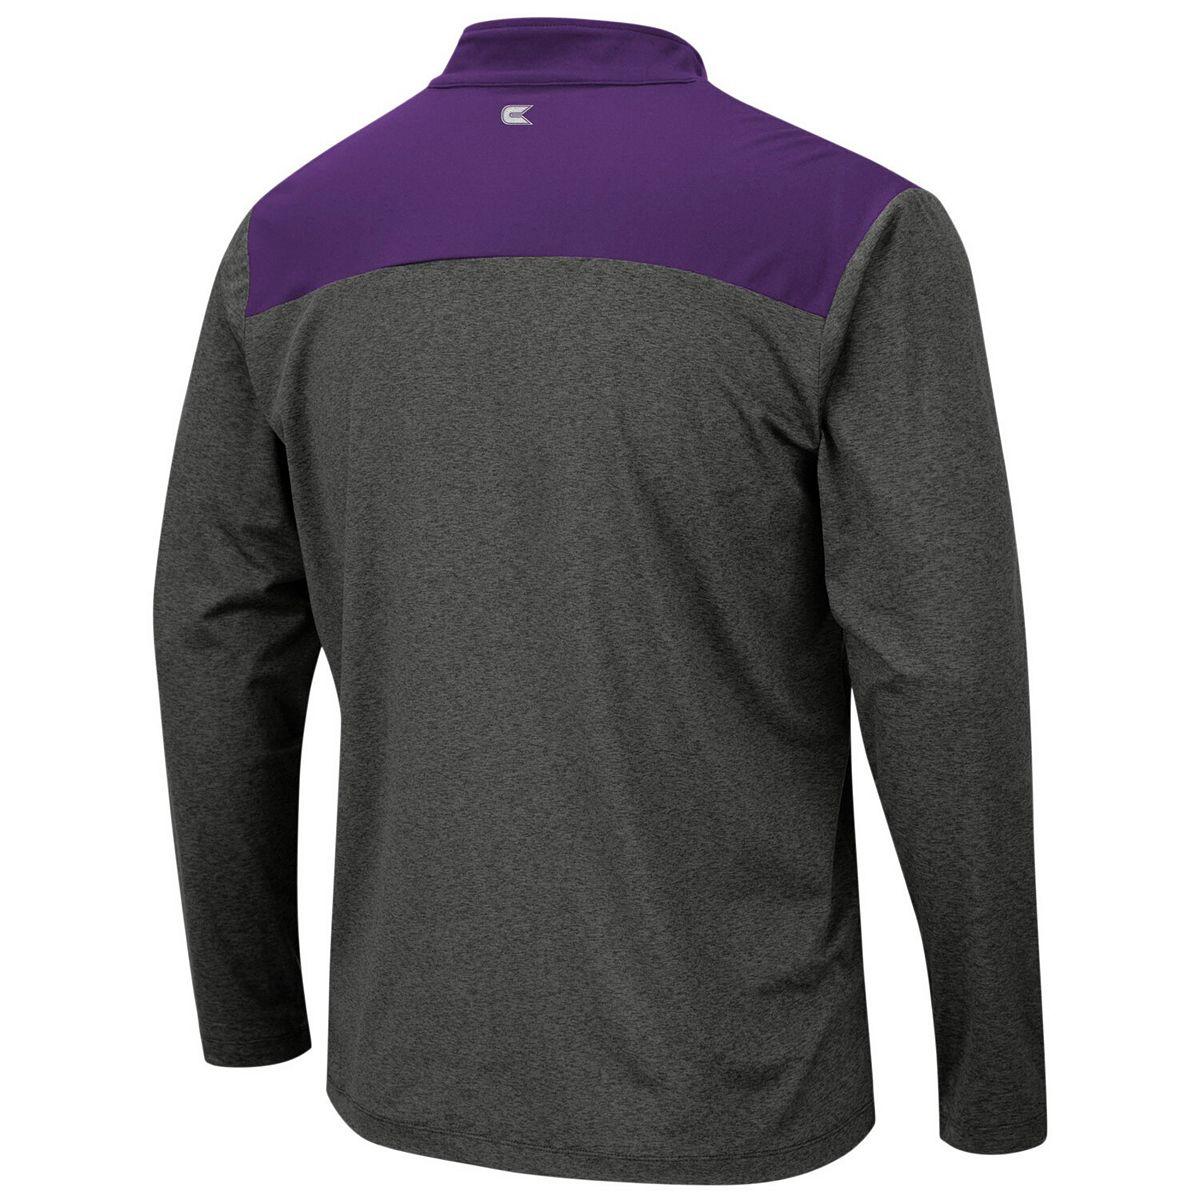 Men's Colosseum Heathered Charcoal TCU Horned Frogs Snowball Windshirt Quarter-Zip Pullover Jacket uzQ3M